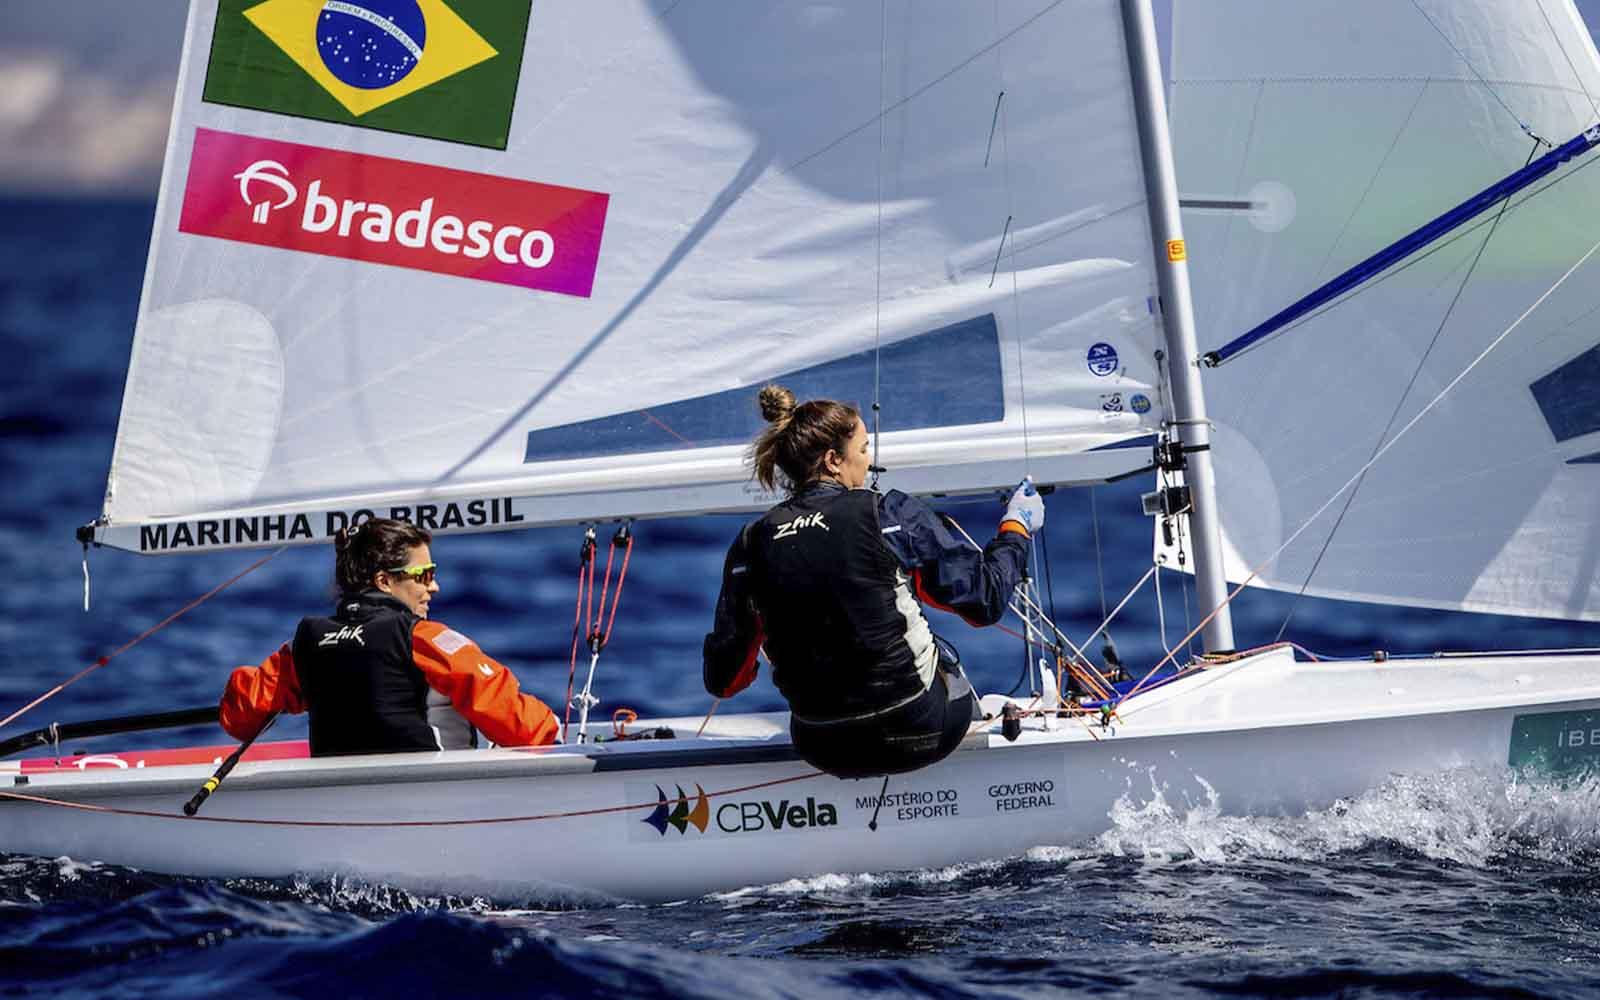 Fernanda Oliveira e Ana Barbachan 02_C rédito Jesus Renedo_Sailing Energy - boat shopping